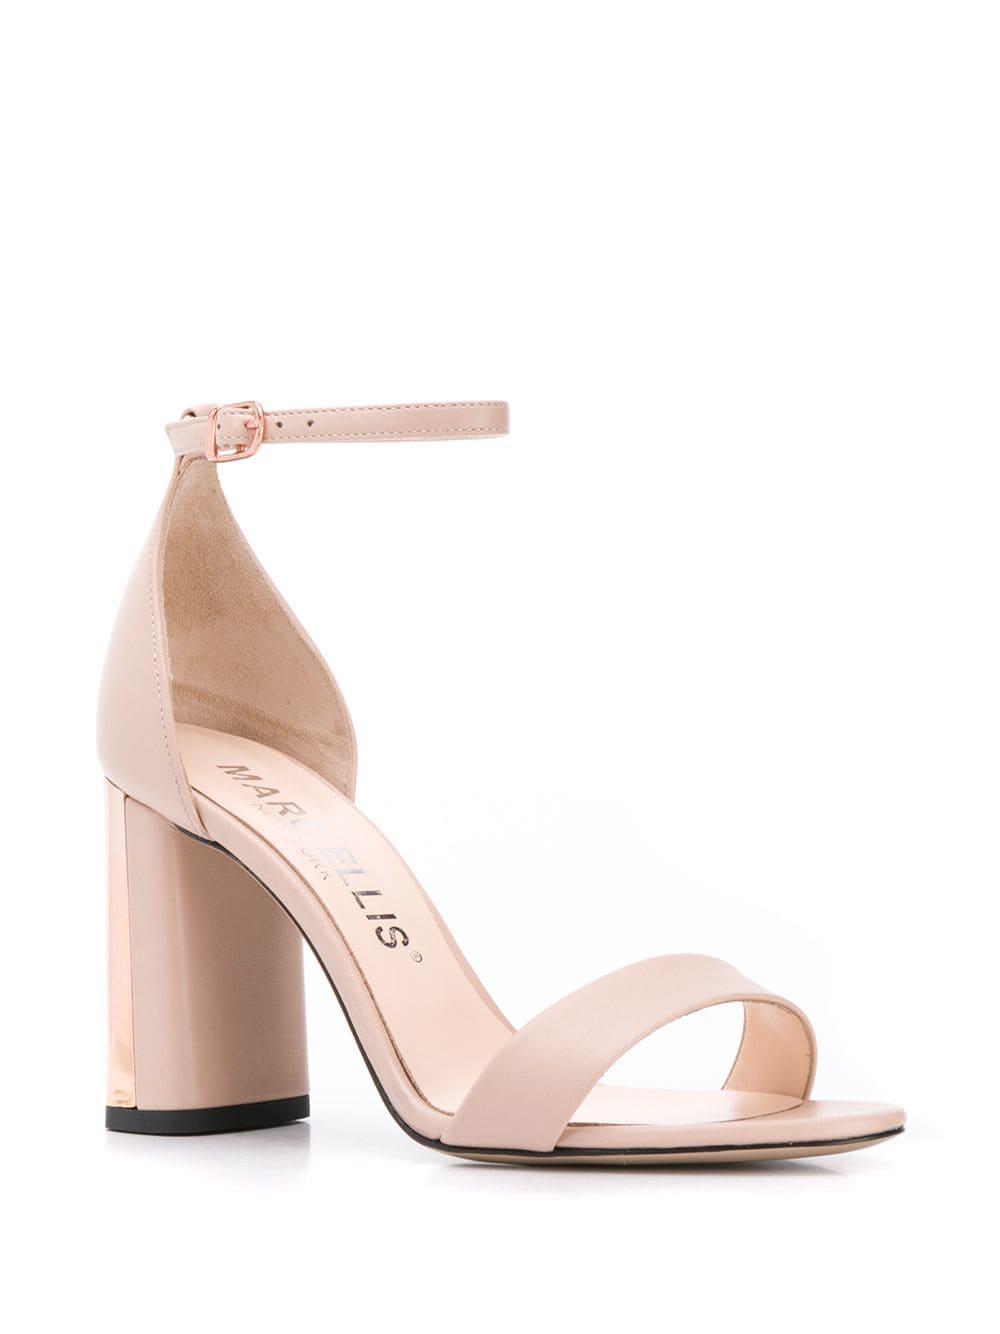 dc56a4bb651c Marc Ellis Block Heel Sandals in Pink - Lyst